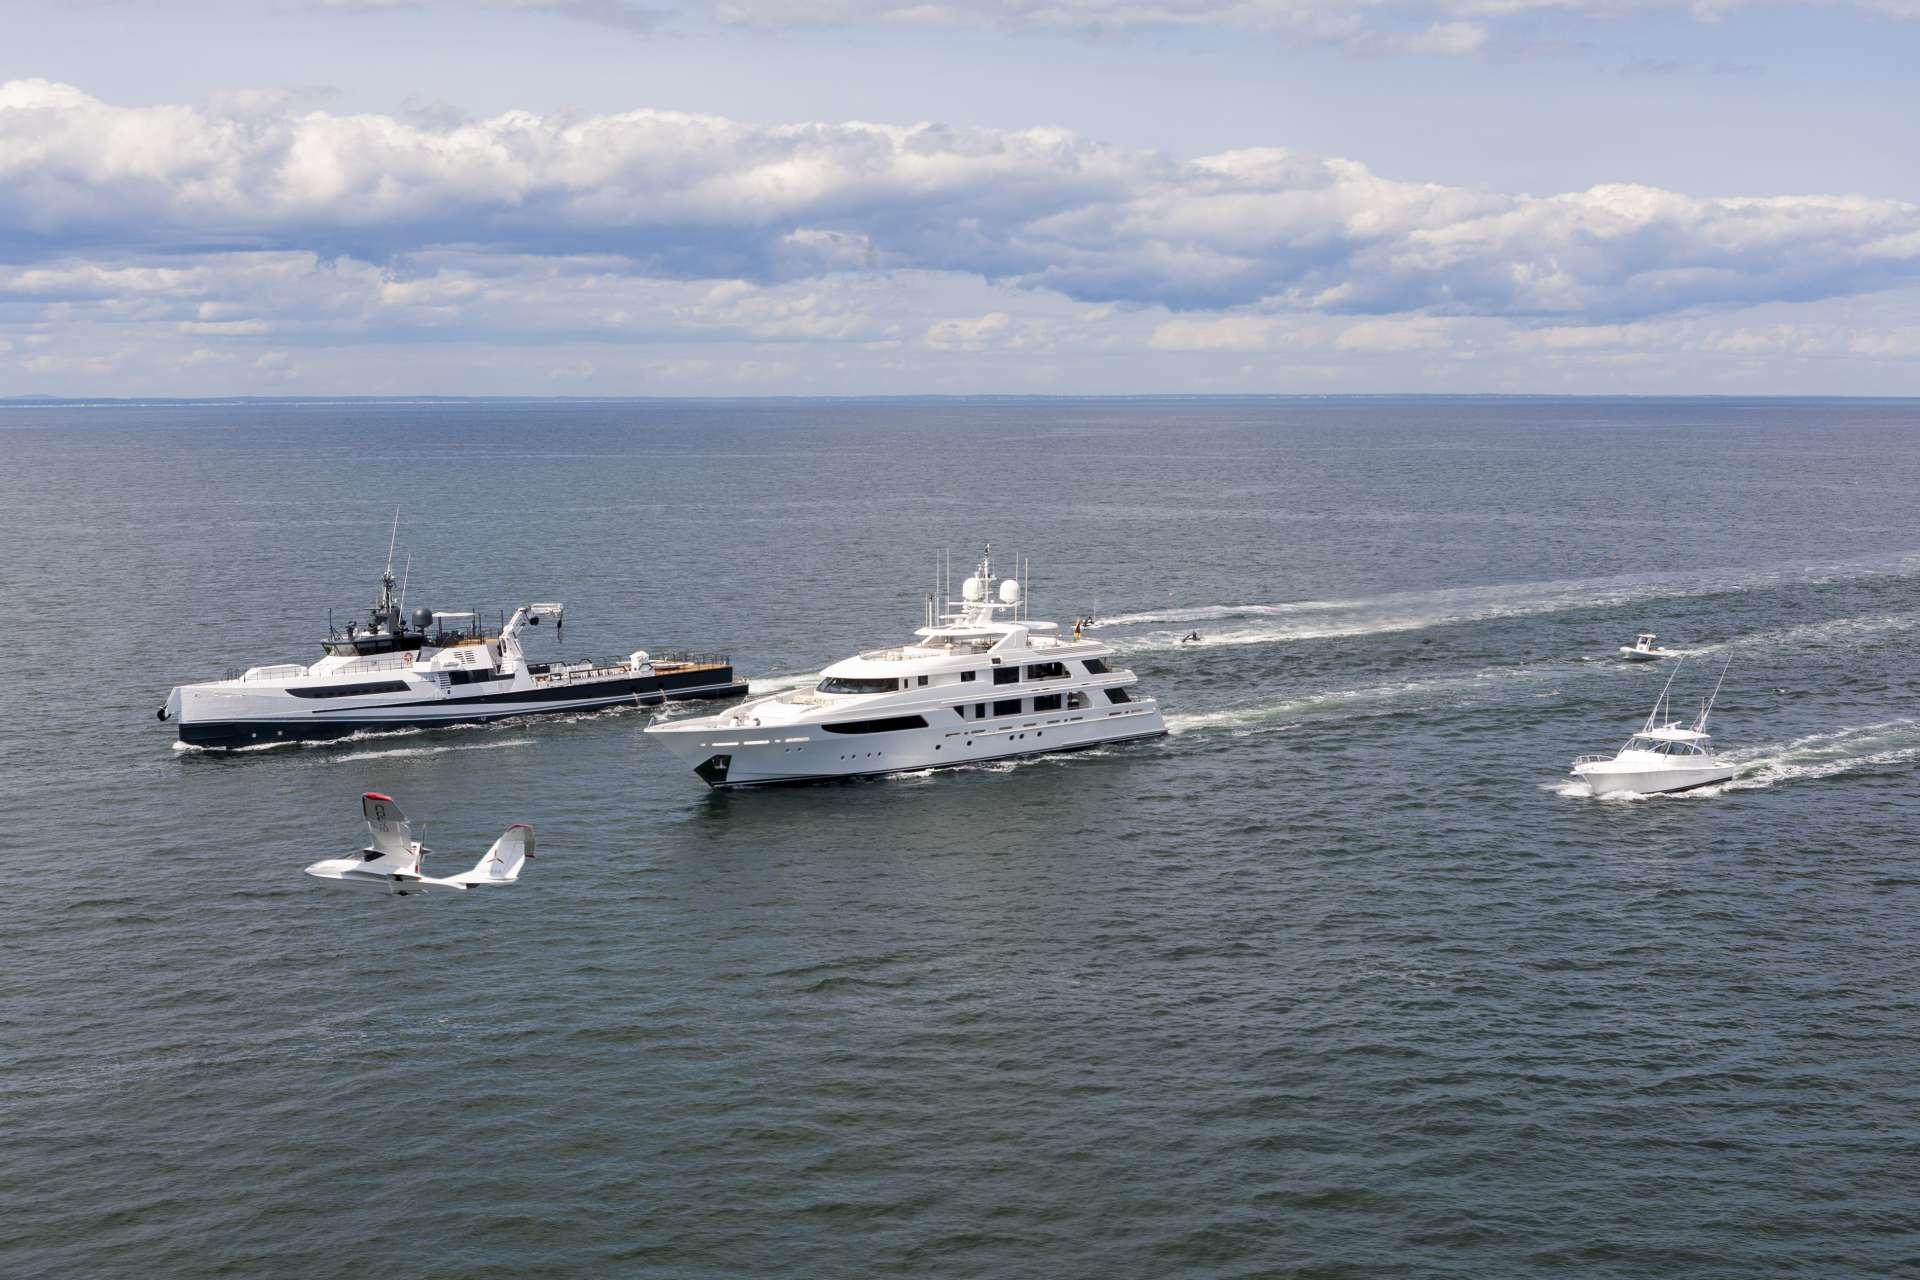 Power Yacht 'Power', 12 PAX, 11 Crew, 164.00 Ft, 50.00 Meters, Built 2010, Westport, Refit Year